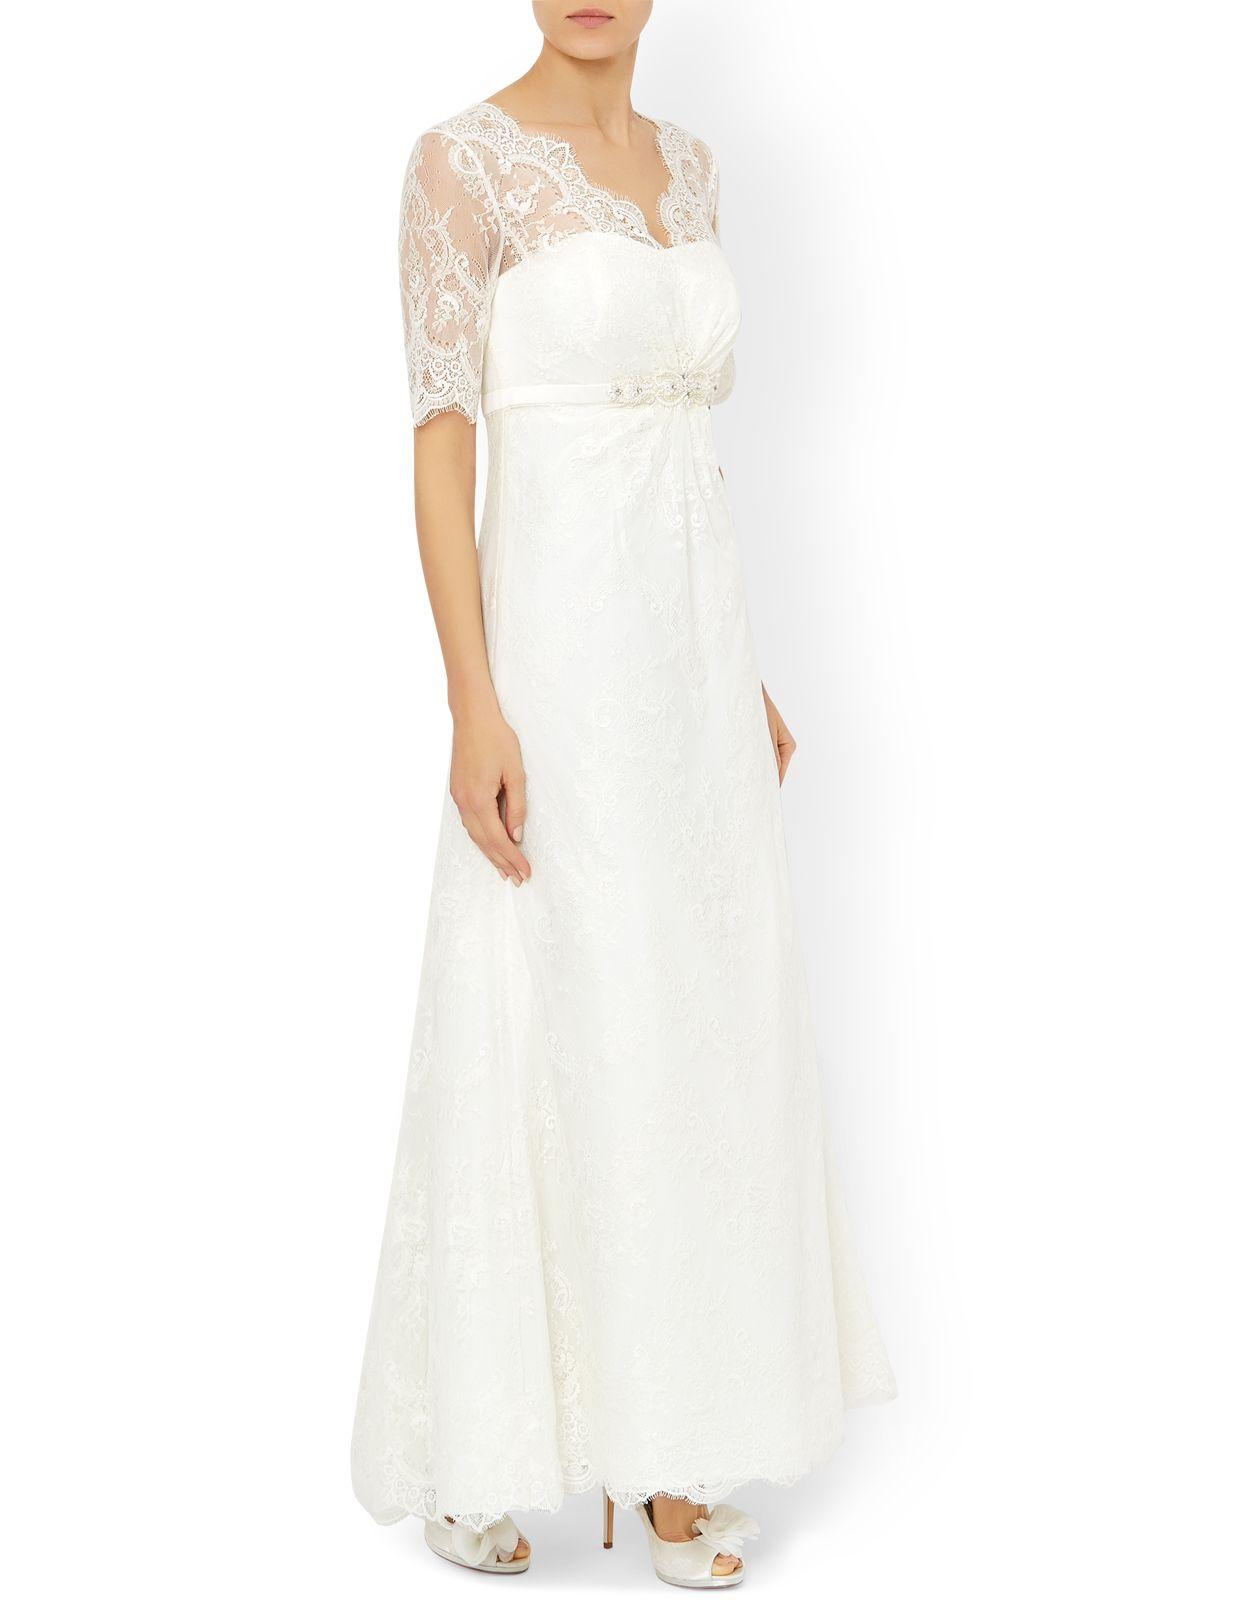 Nevena Bridal Dress Http Www Weddingheart Co Uk Monsoon